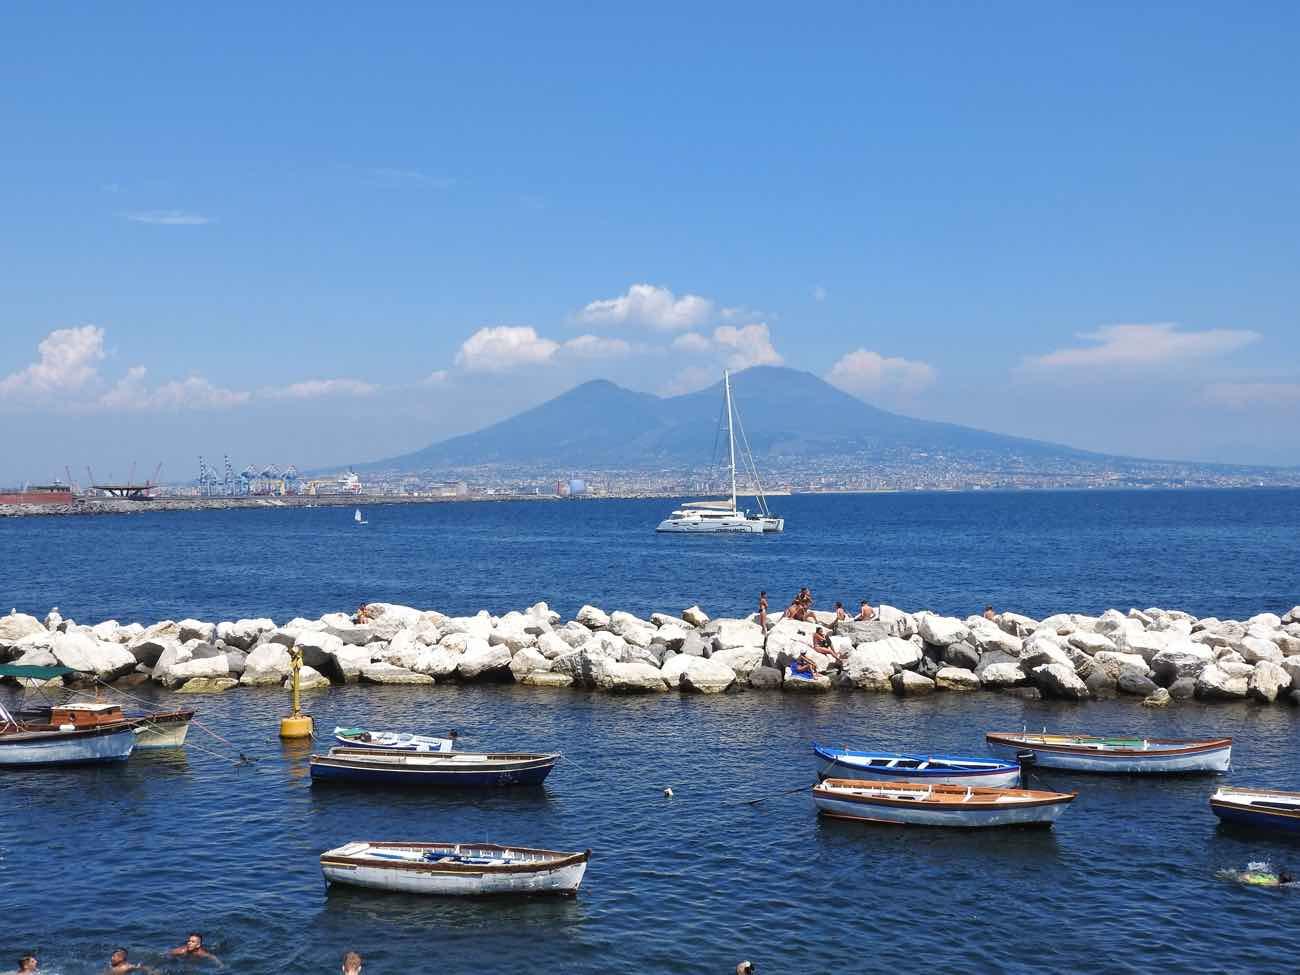 planning a trip to naples italy amalfi coast pompeii vesuvius - naples napoli sea